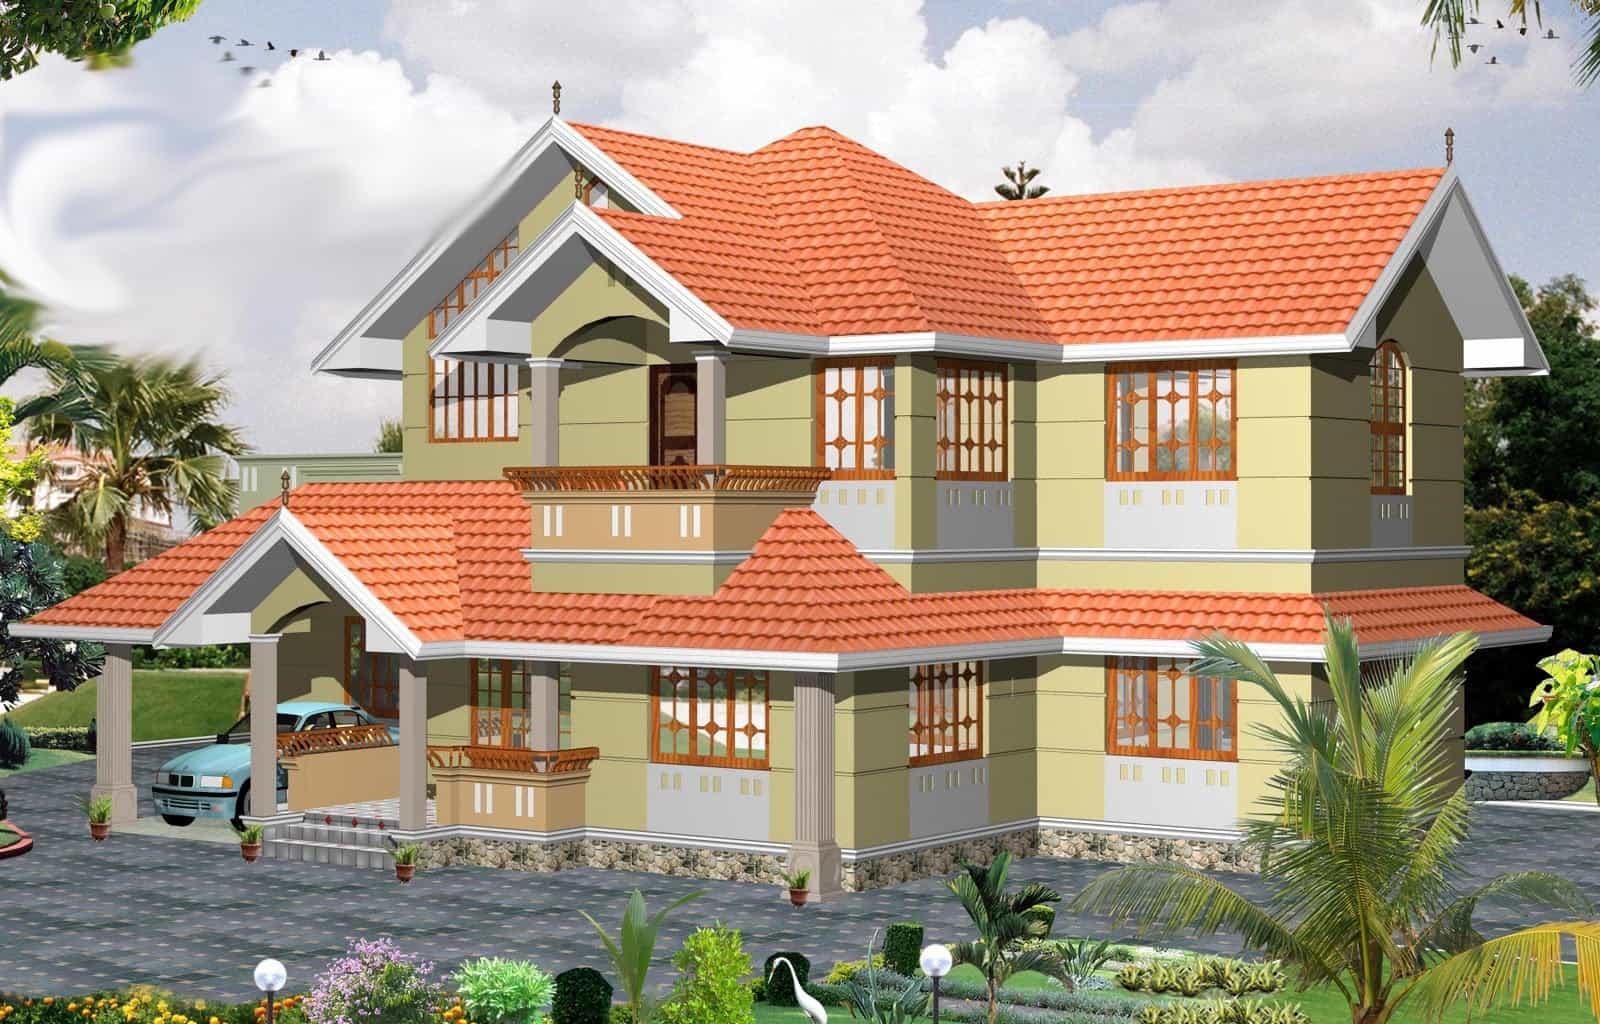 Traditional 3 BHK Kerala Villa Design at 2000 sq.ft